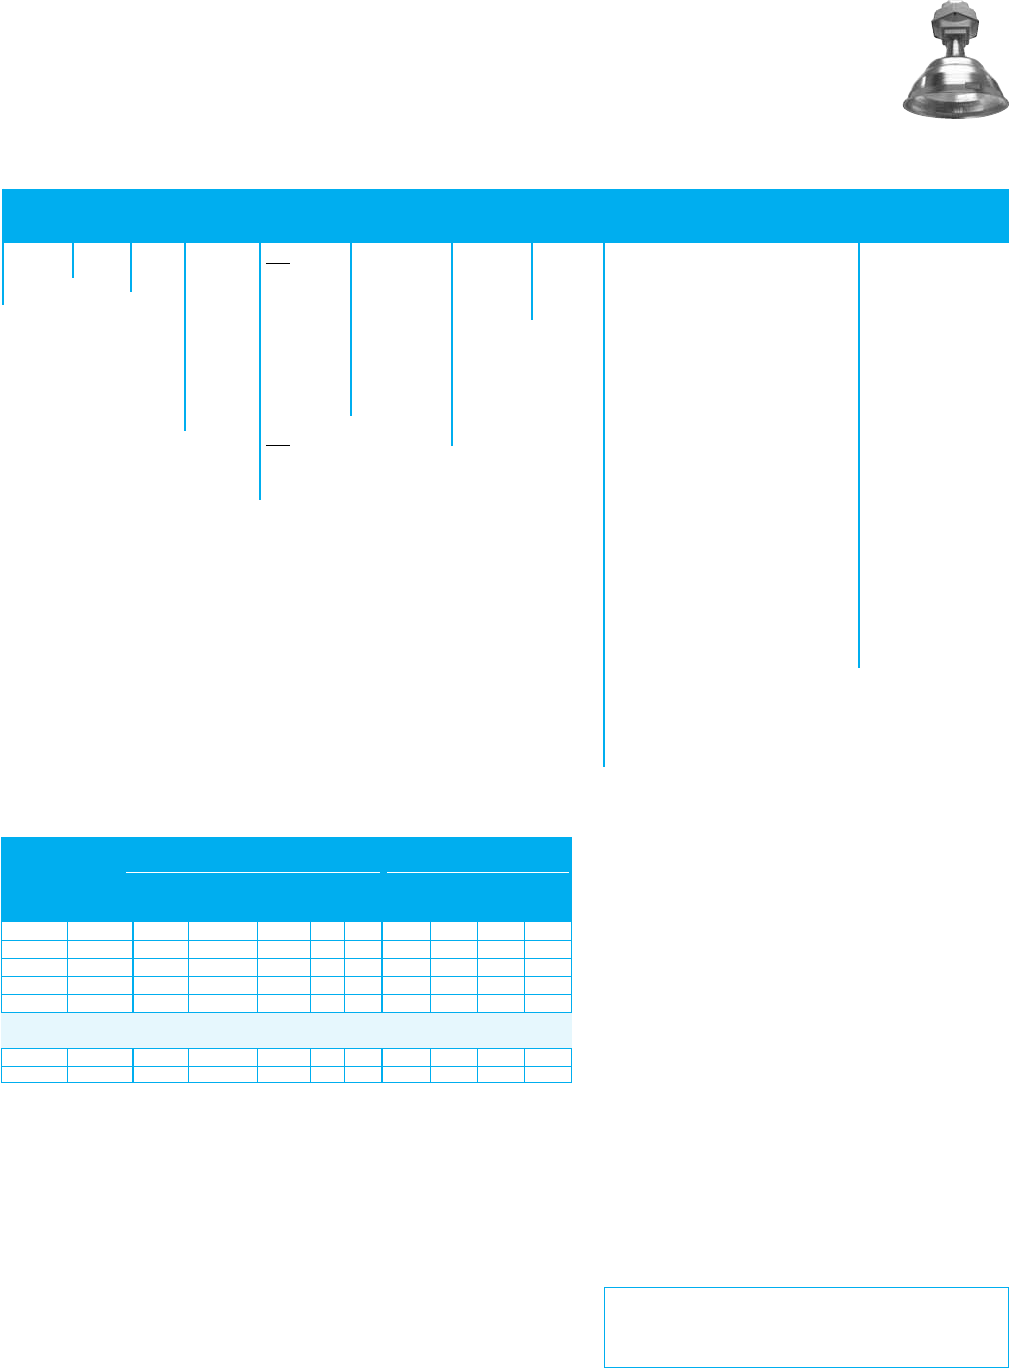 Ge Appliances Ug6 Data Sheet Indoor Lighting Fixtures High ... on